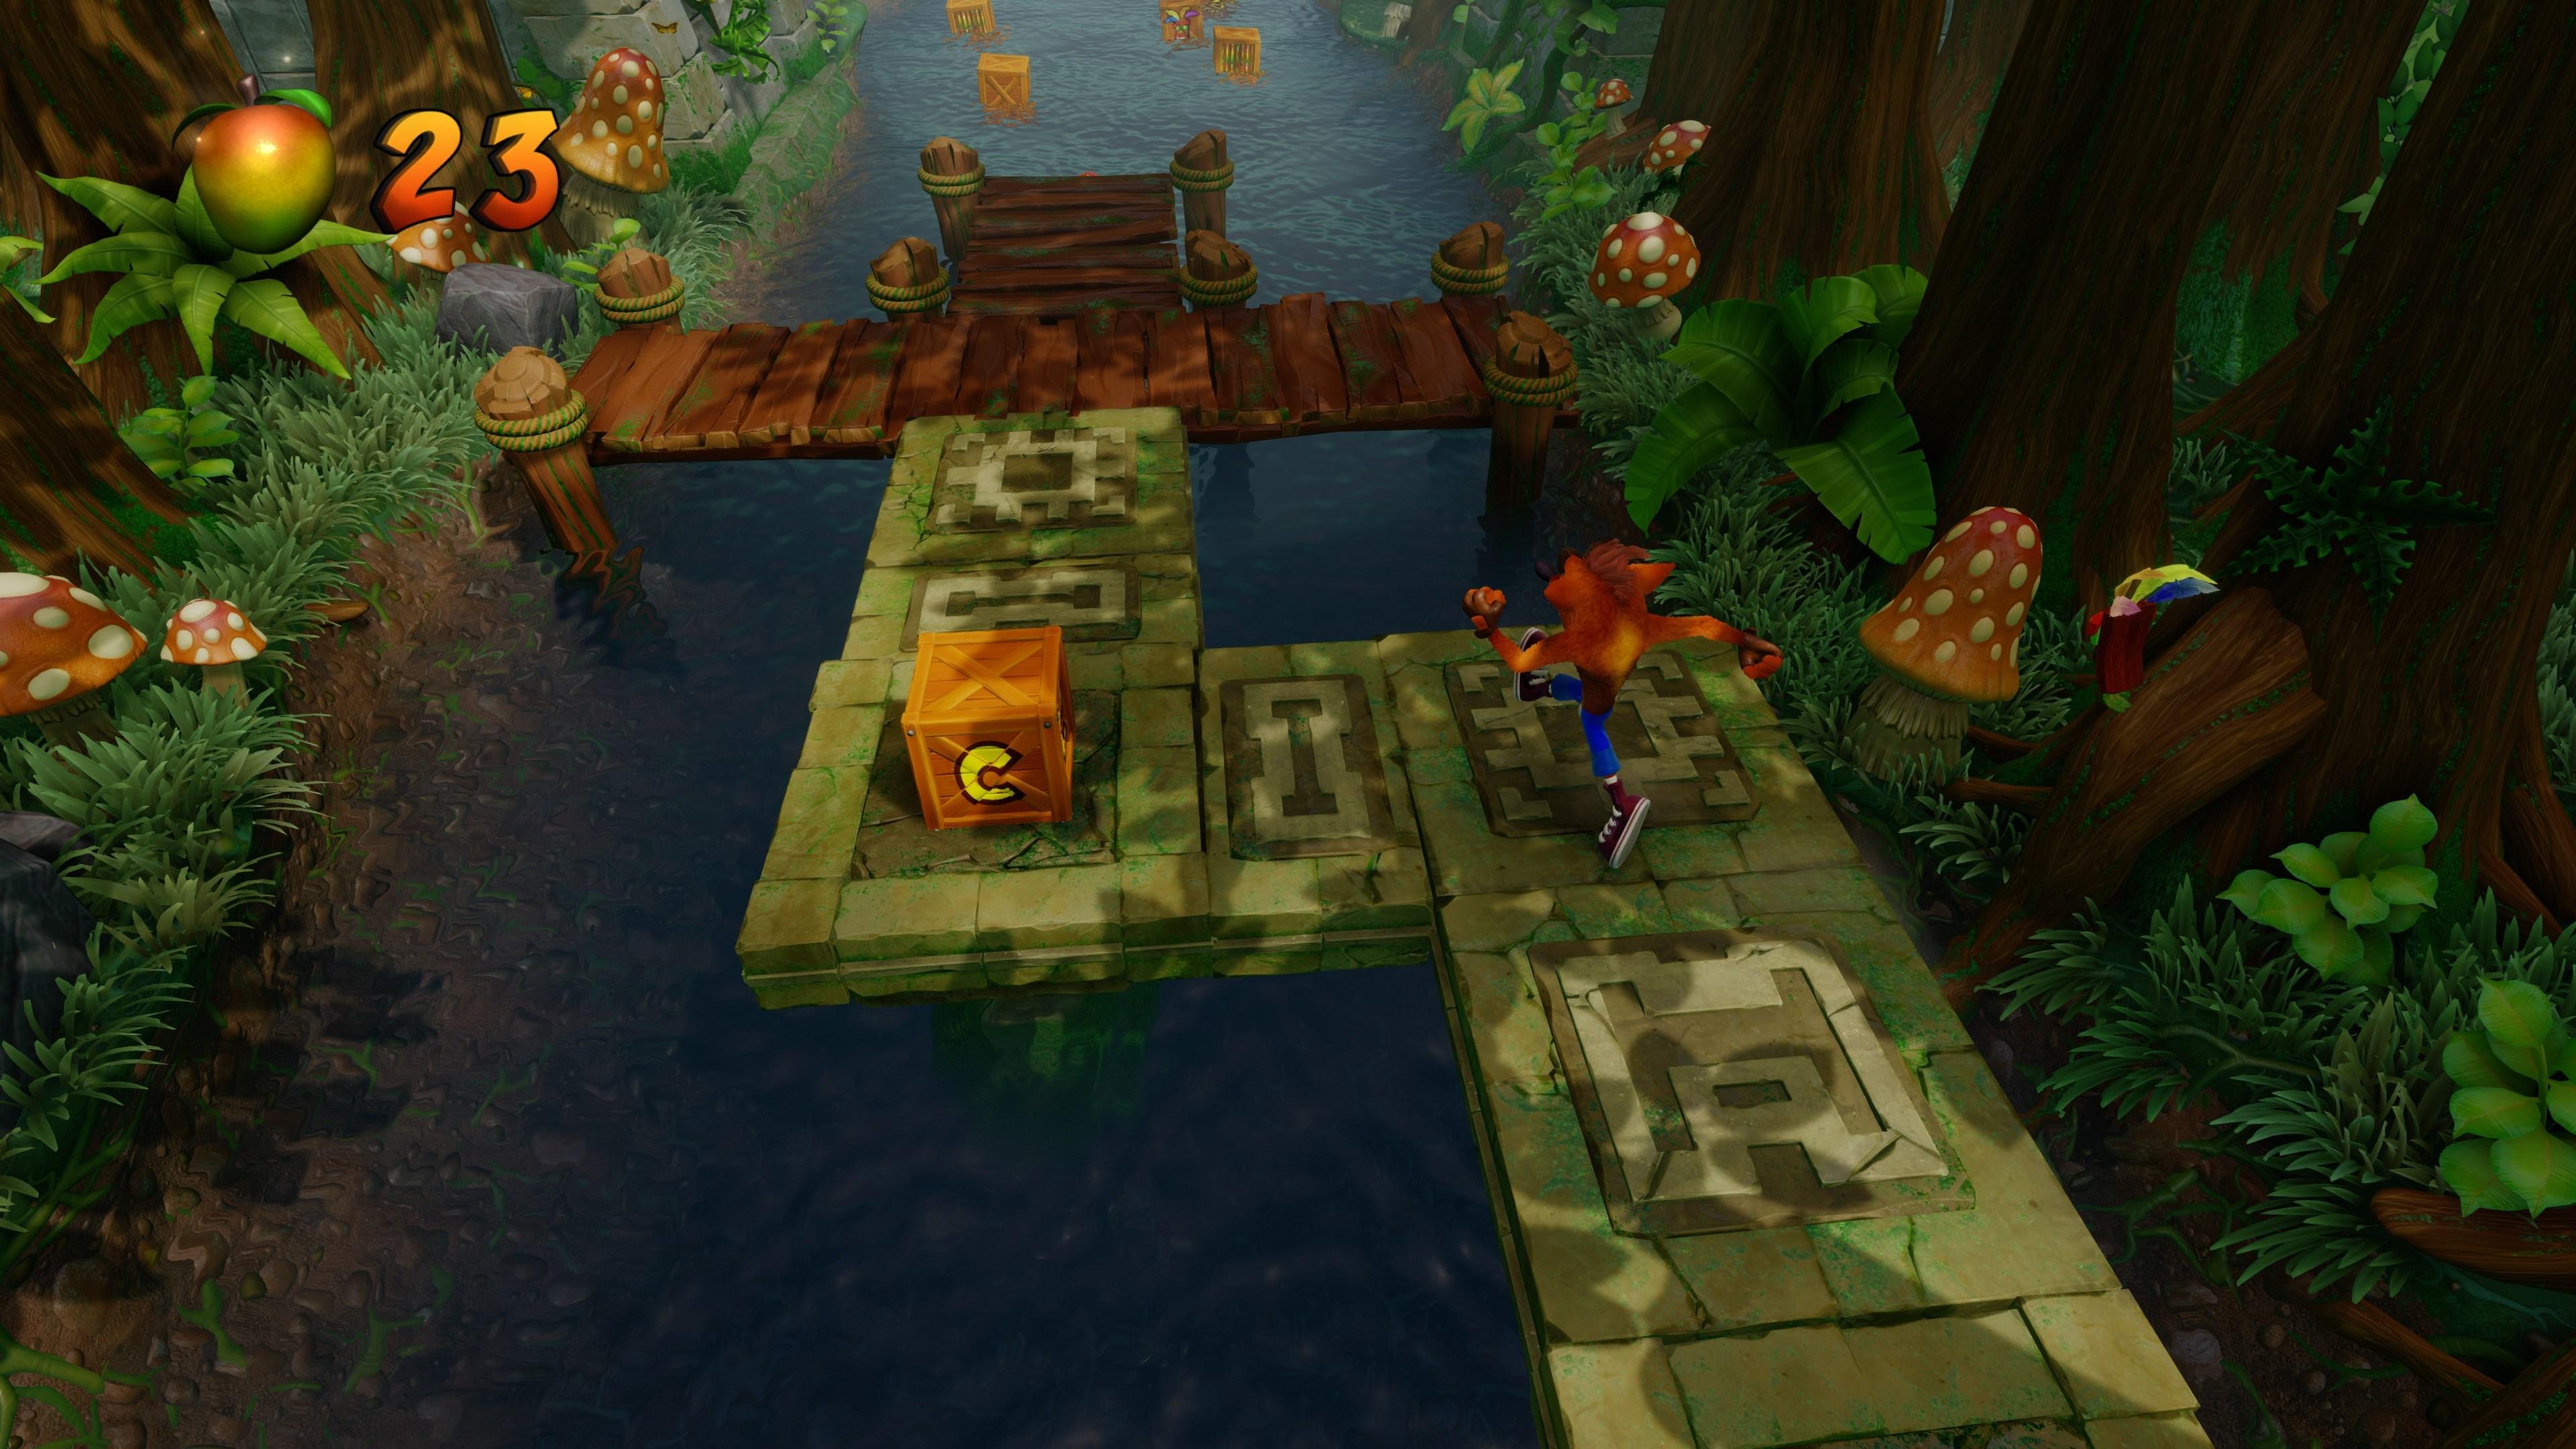 Crash Bandicoot 2: Cortex Strikes Back - Crash Bandicoot N. Sane Trilogy 4K